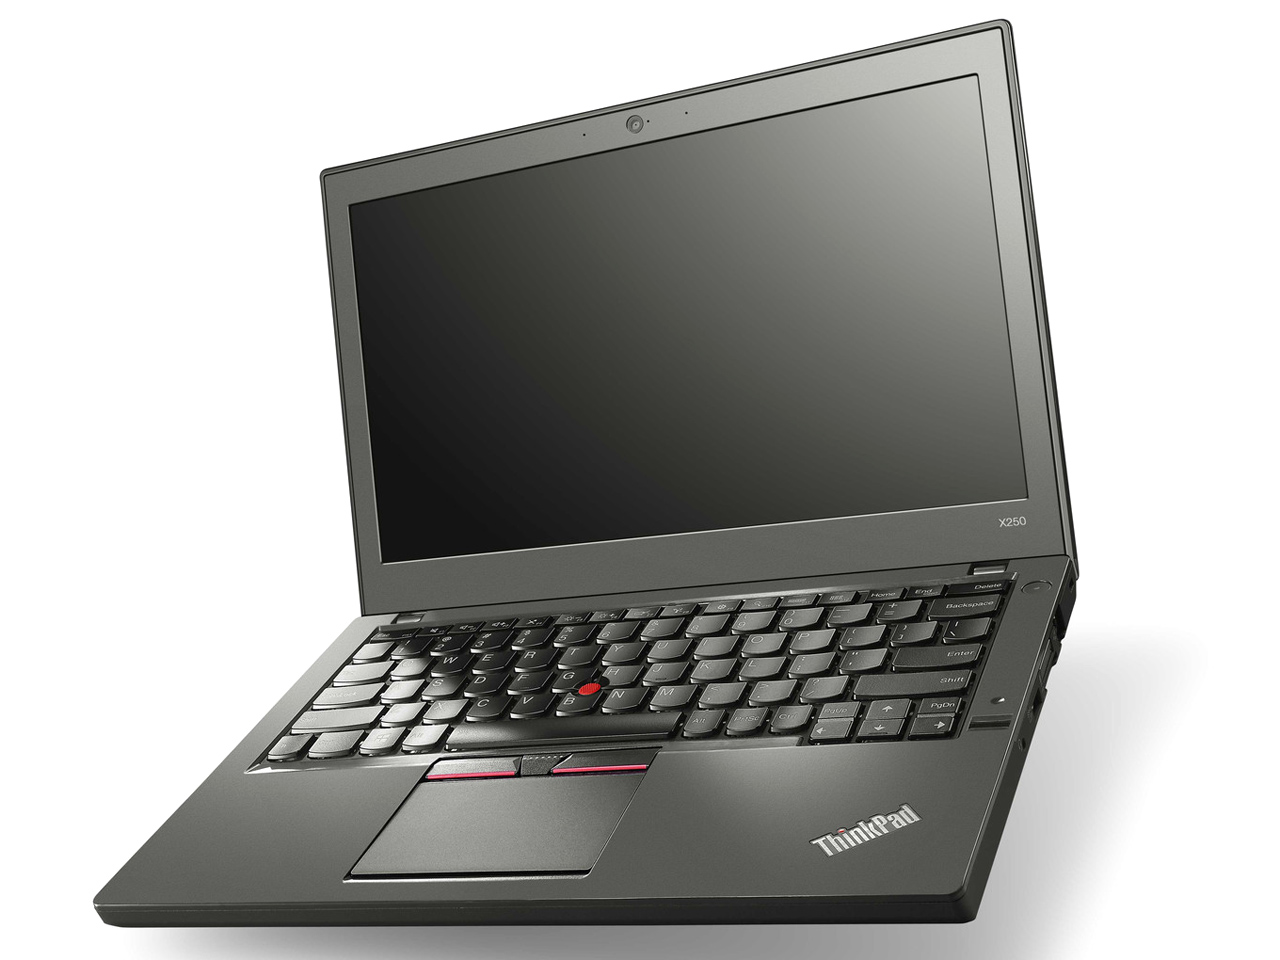 Lenovo ThinkPad E31-80 Energy Management Drivers Windows XP